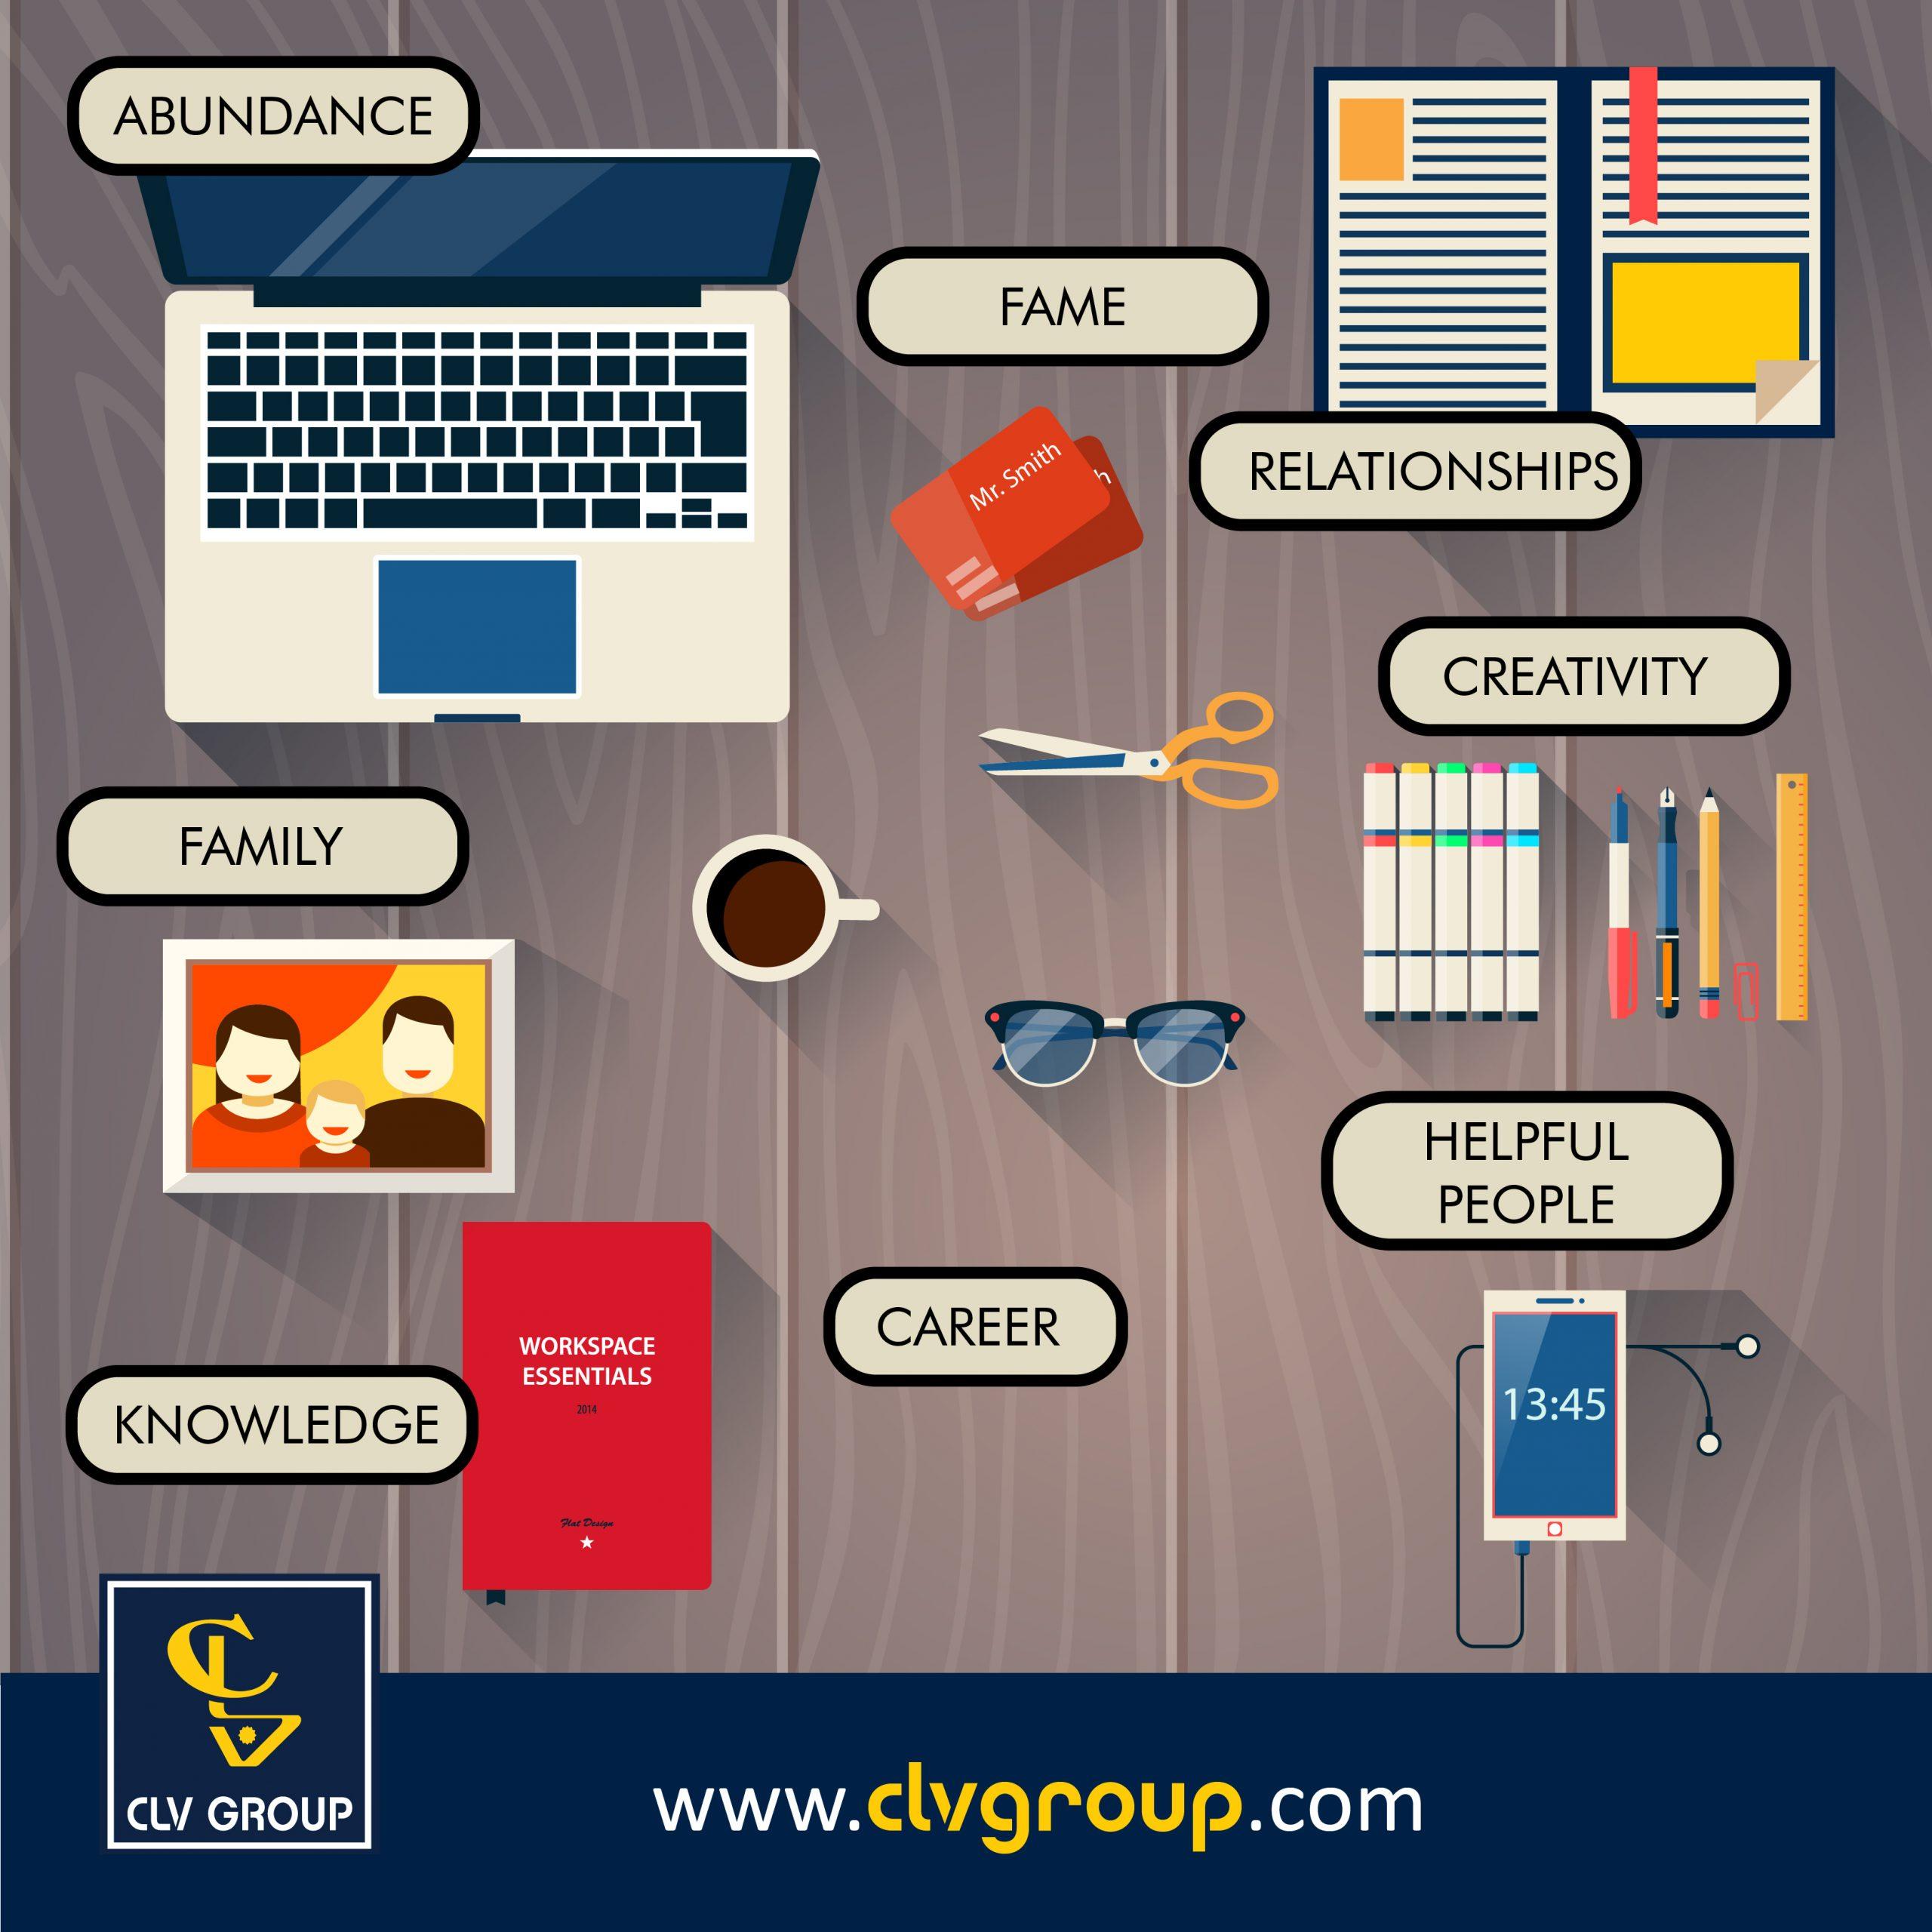 CLV-Group-Feng-Shui-Your-Desk